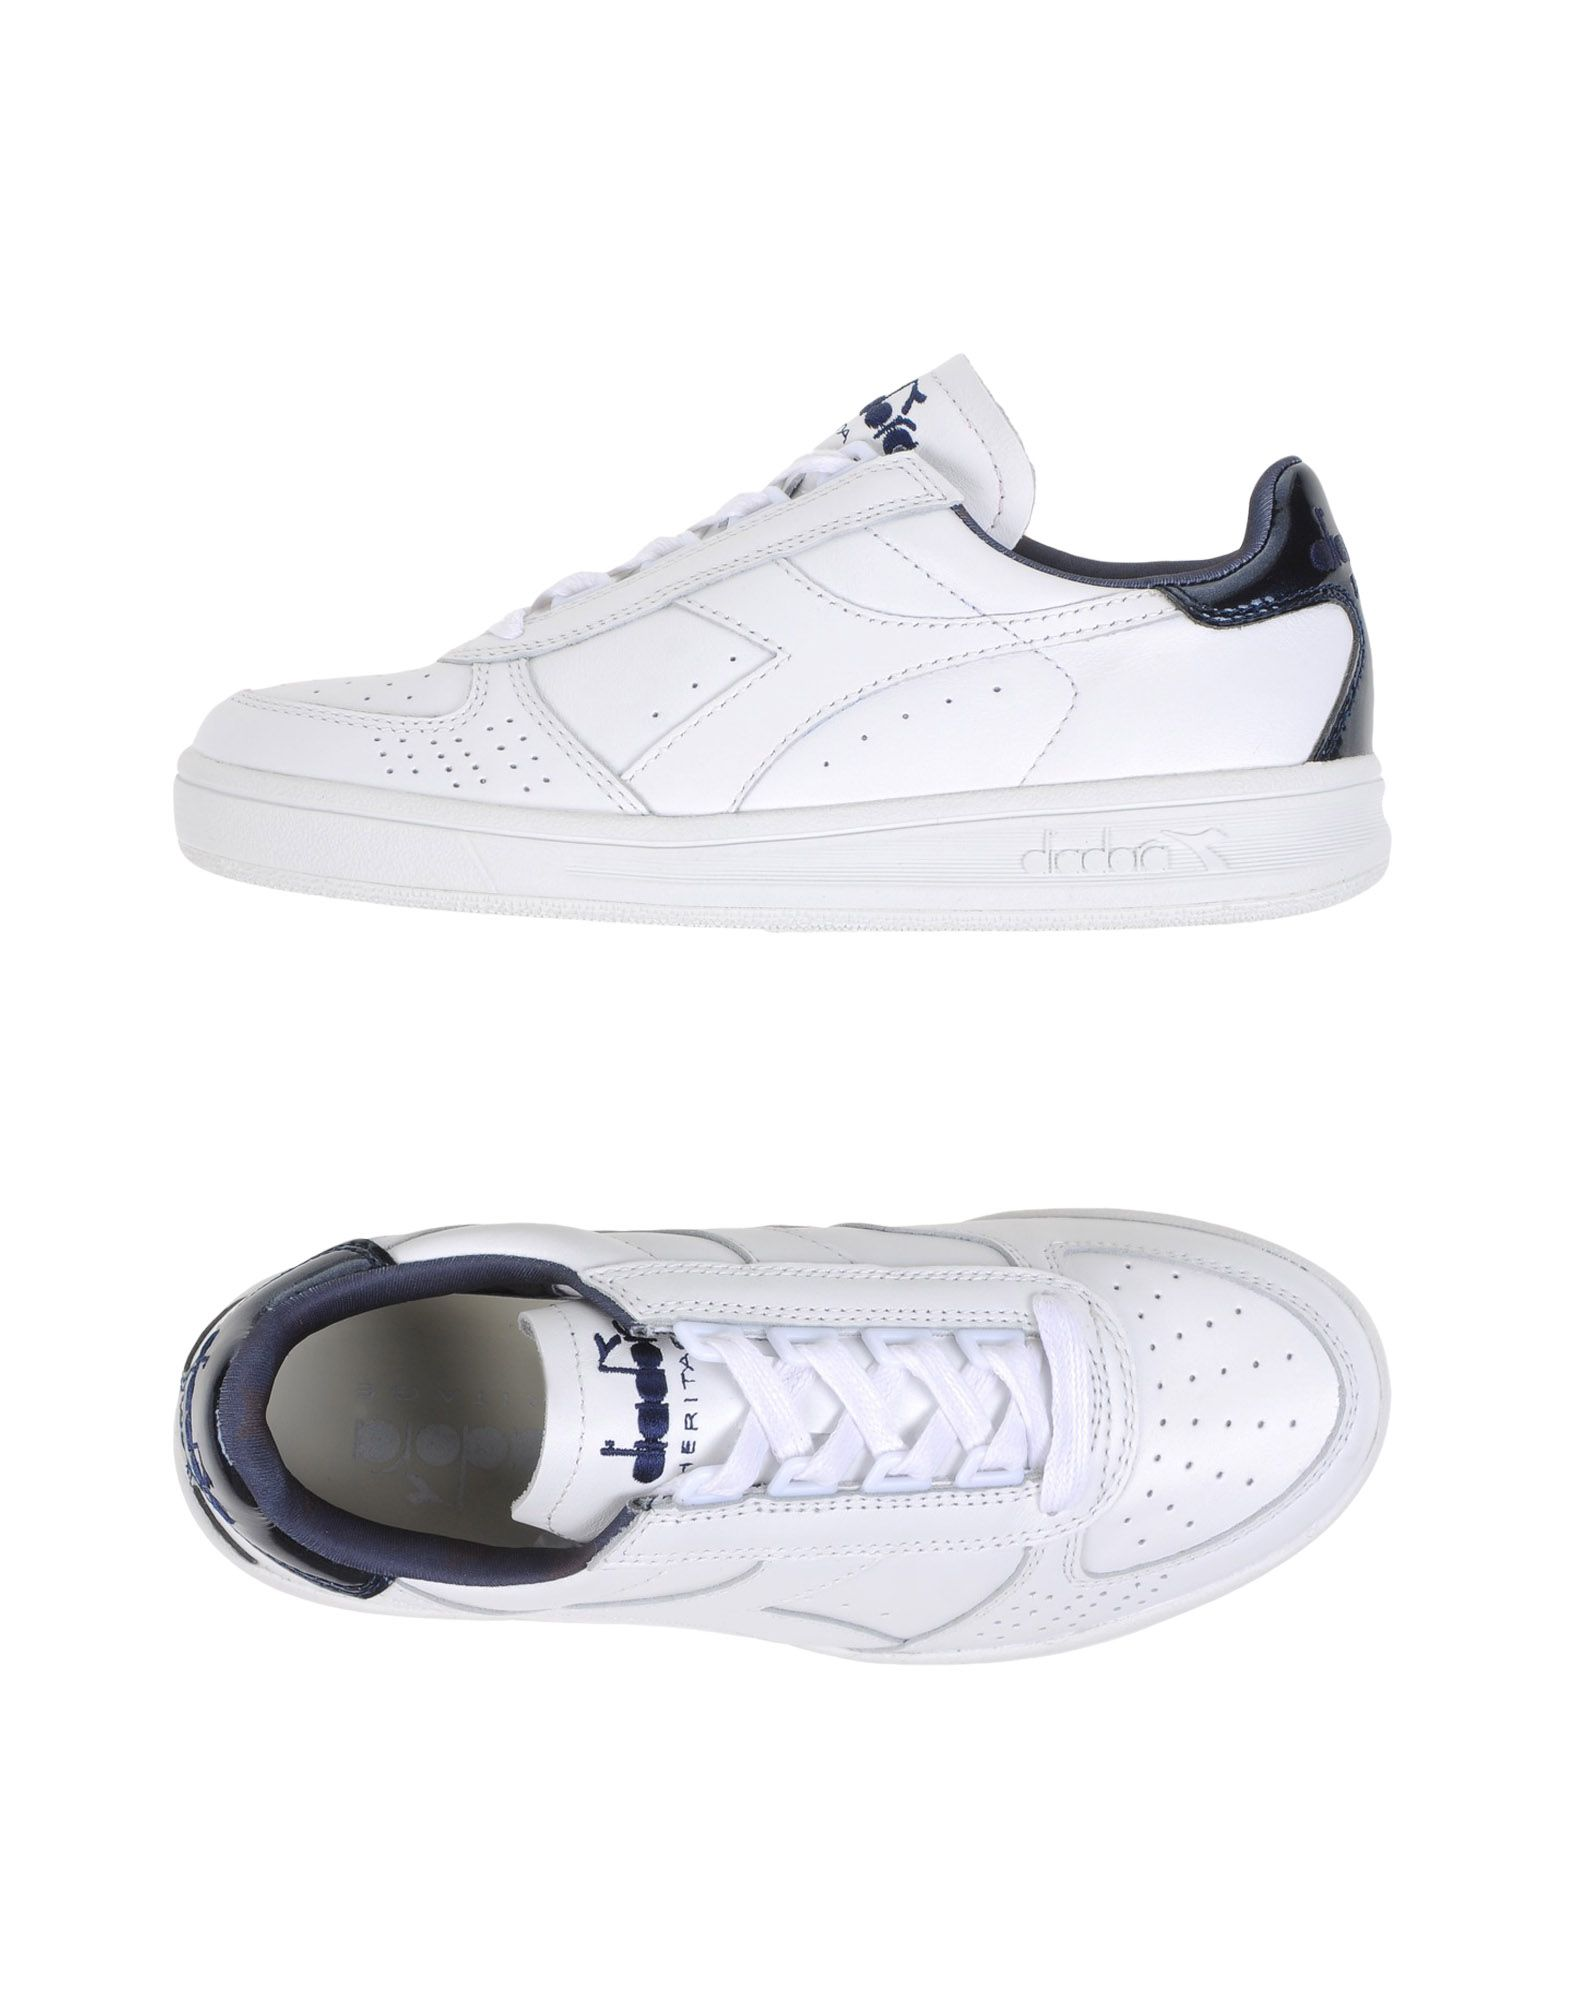 Diadora Heritage B.Elite Liquid - Sneakers - Women Diadora Heritage ... 8346a88c0ec